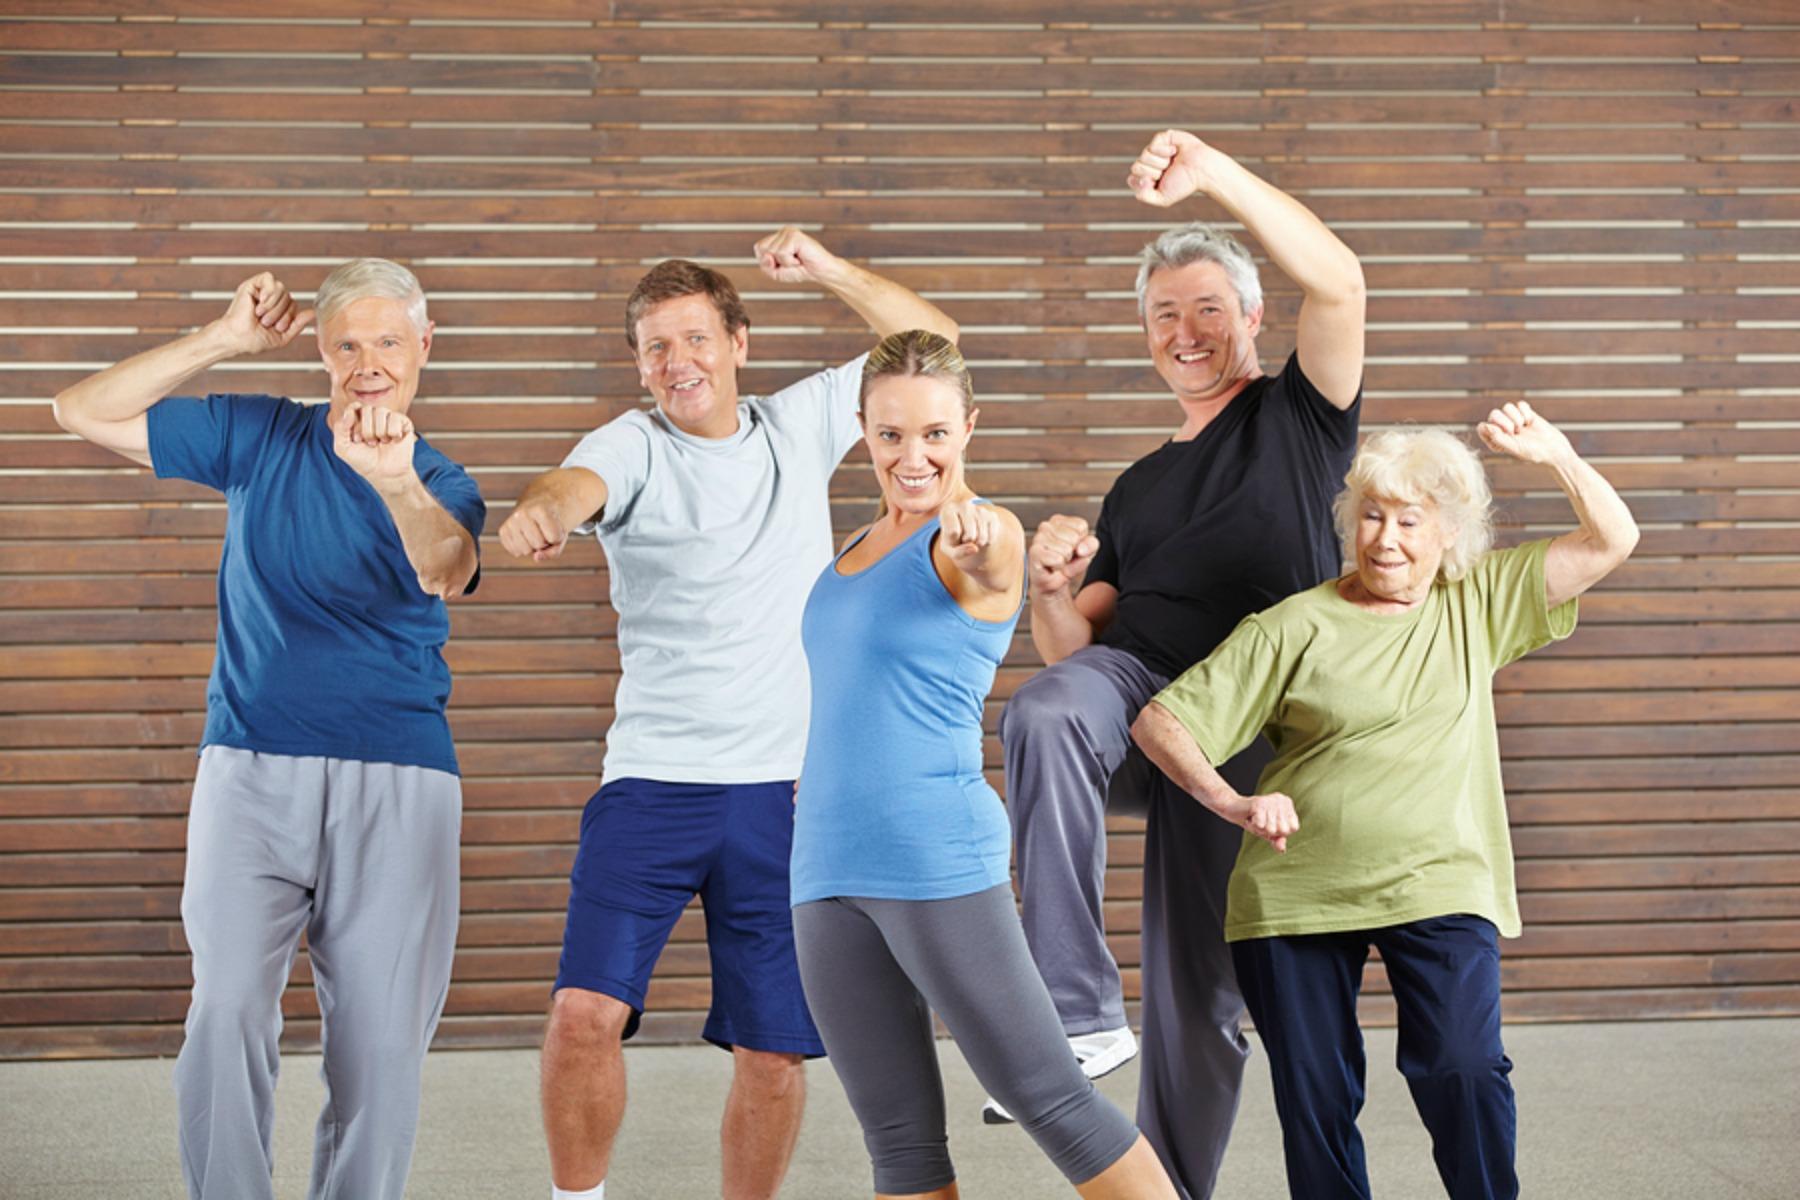 Elderly Care in Pittsburgh PA: Dementia